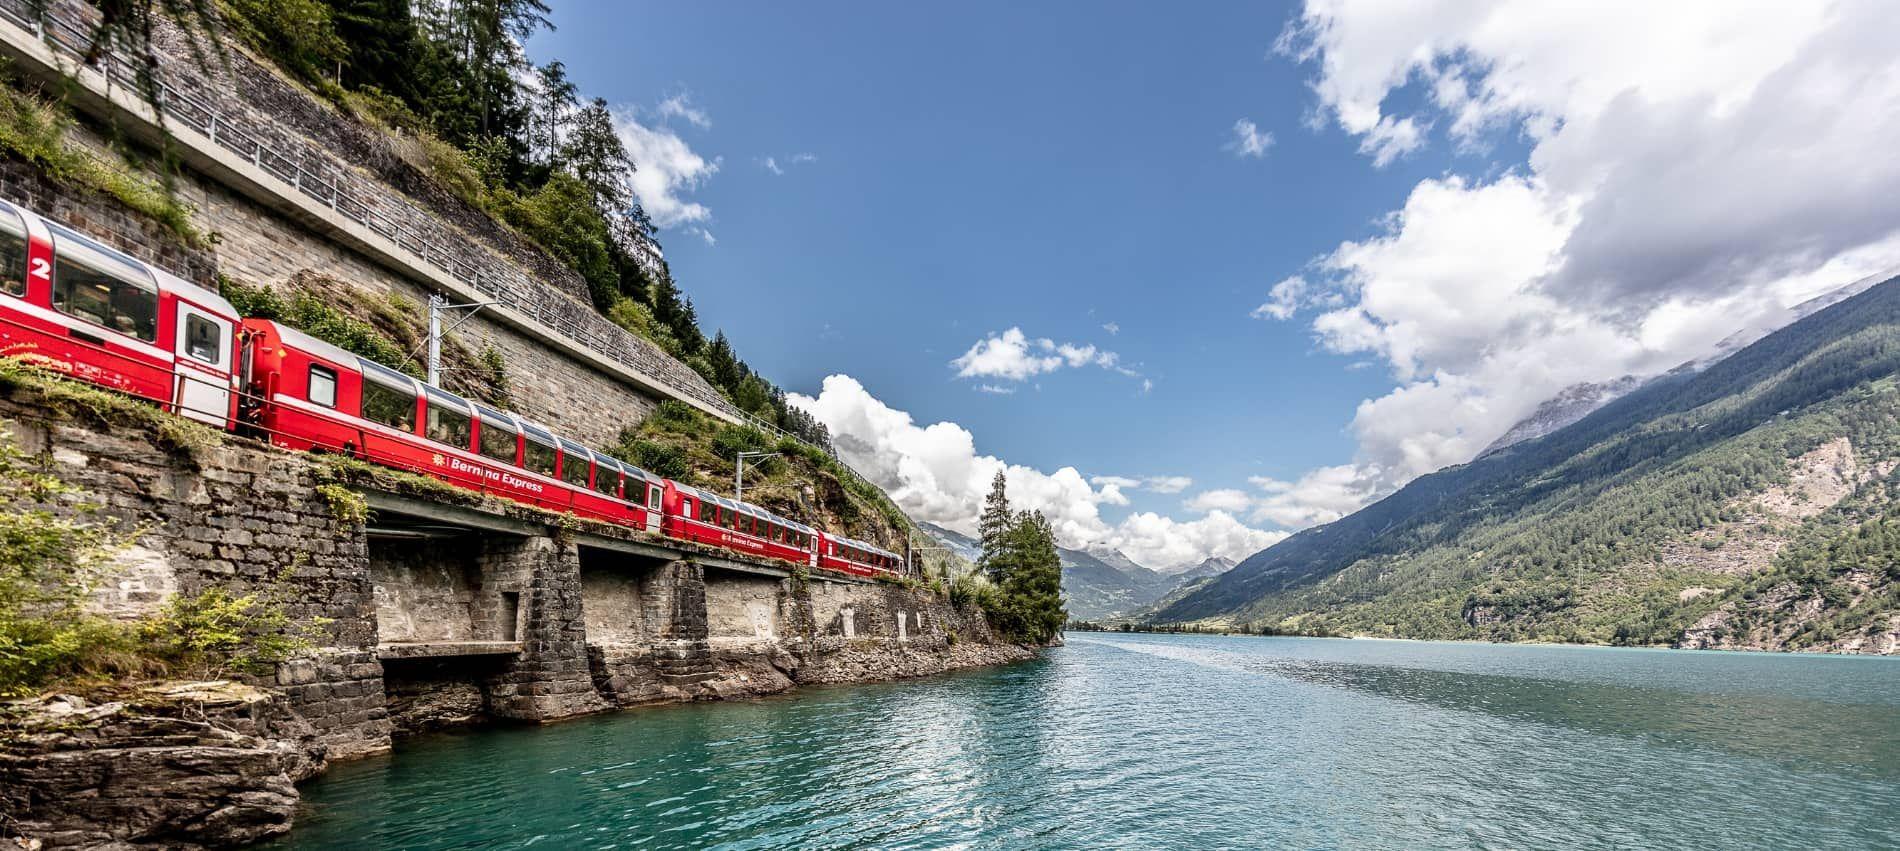 ⓒ Swiss Tourism| Andrea Badrutt